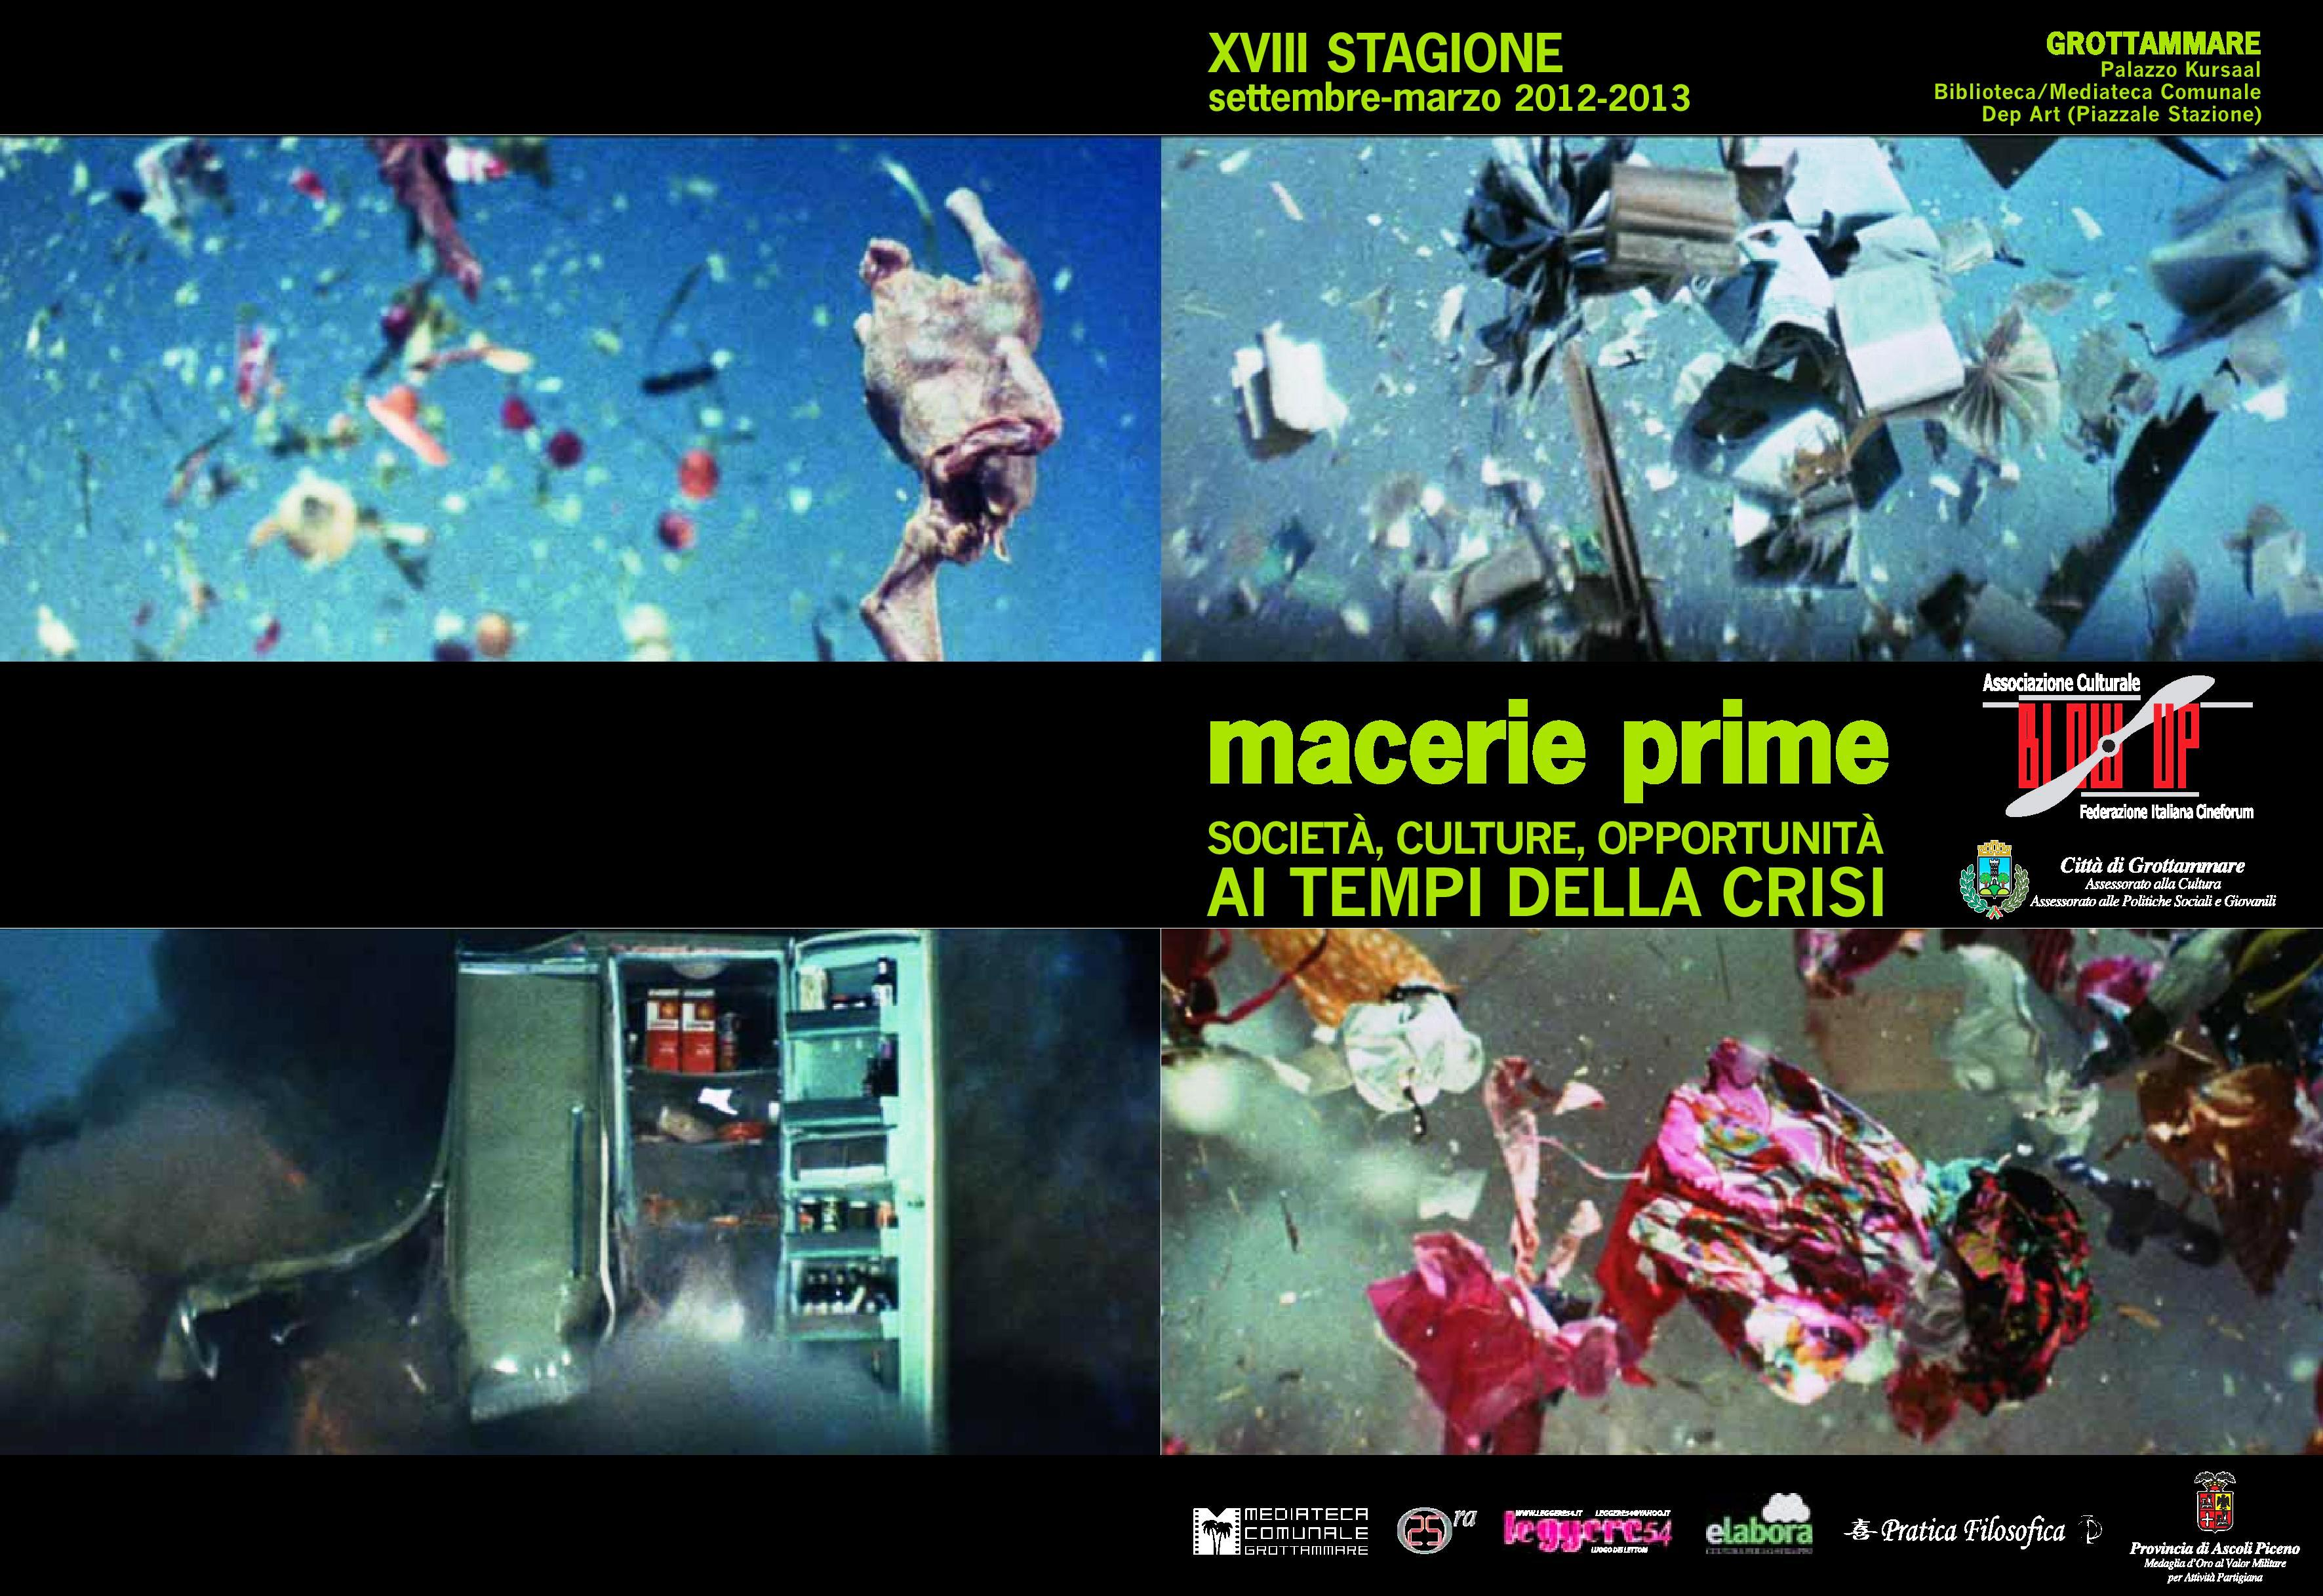 Macerie Prime Blow Up